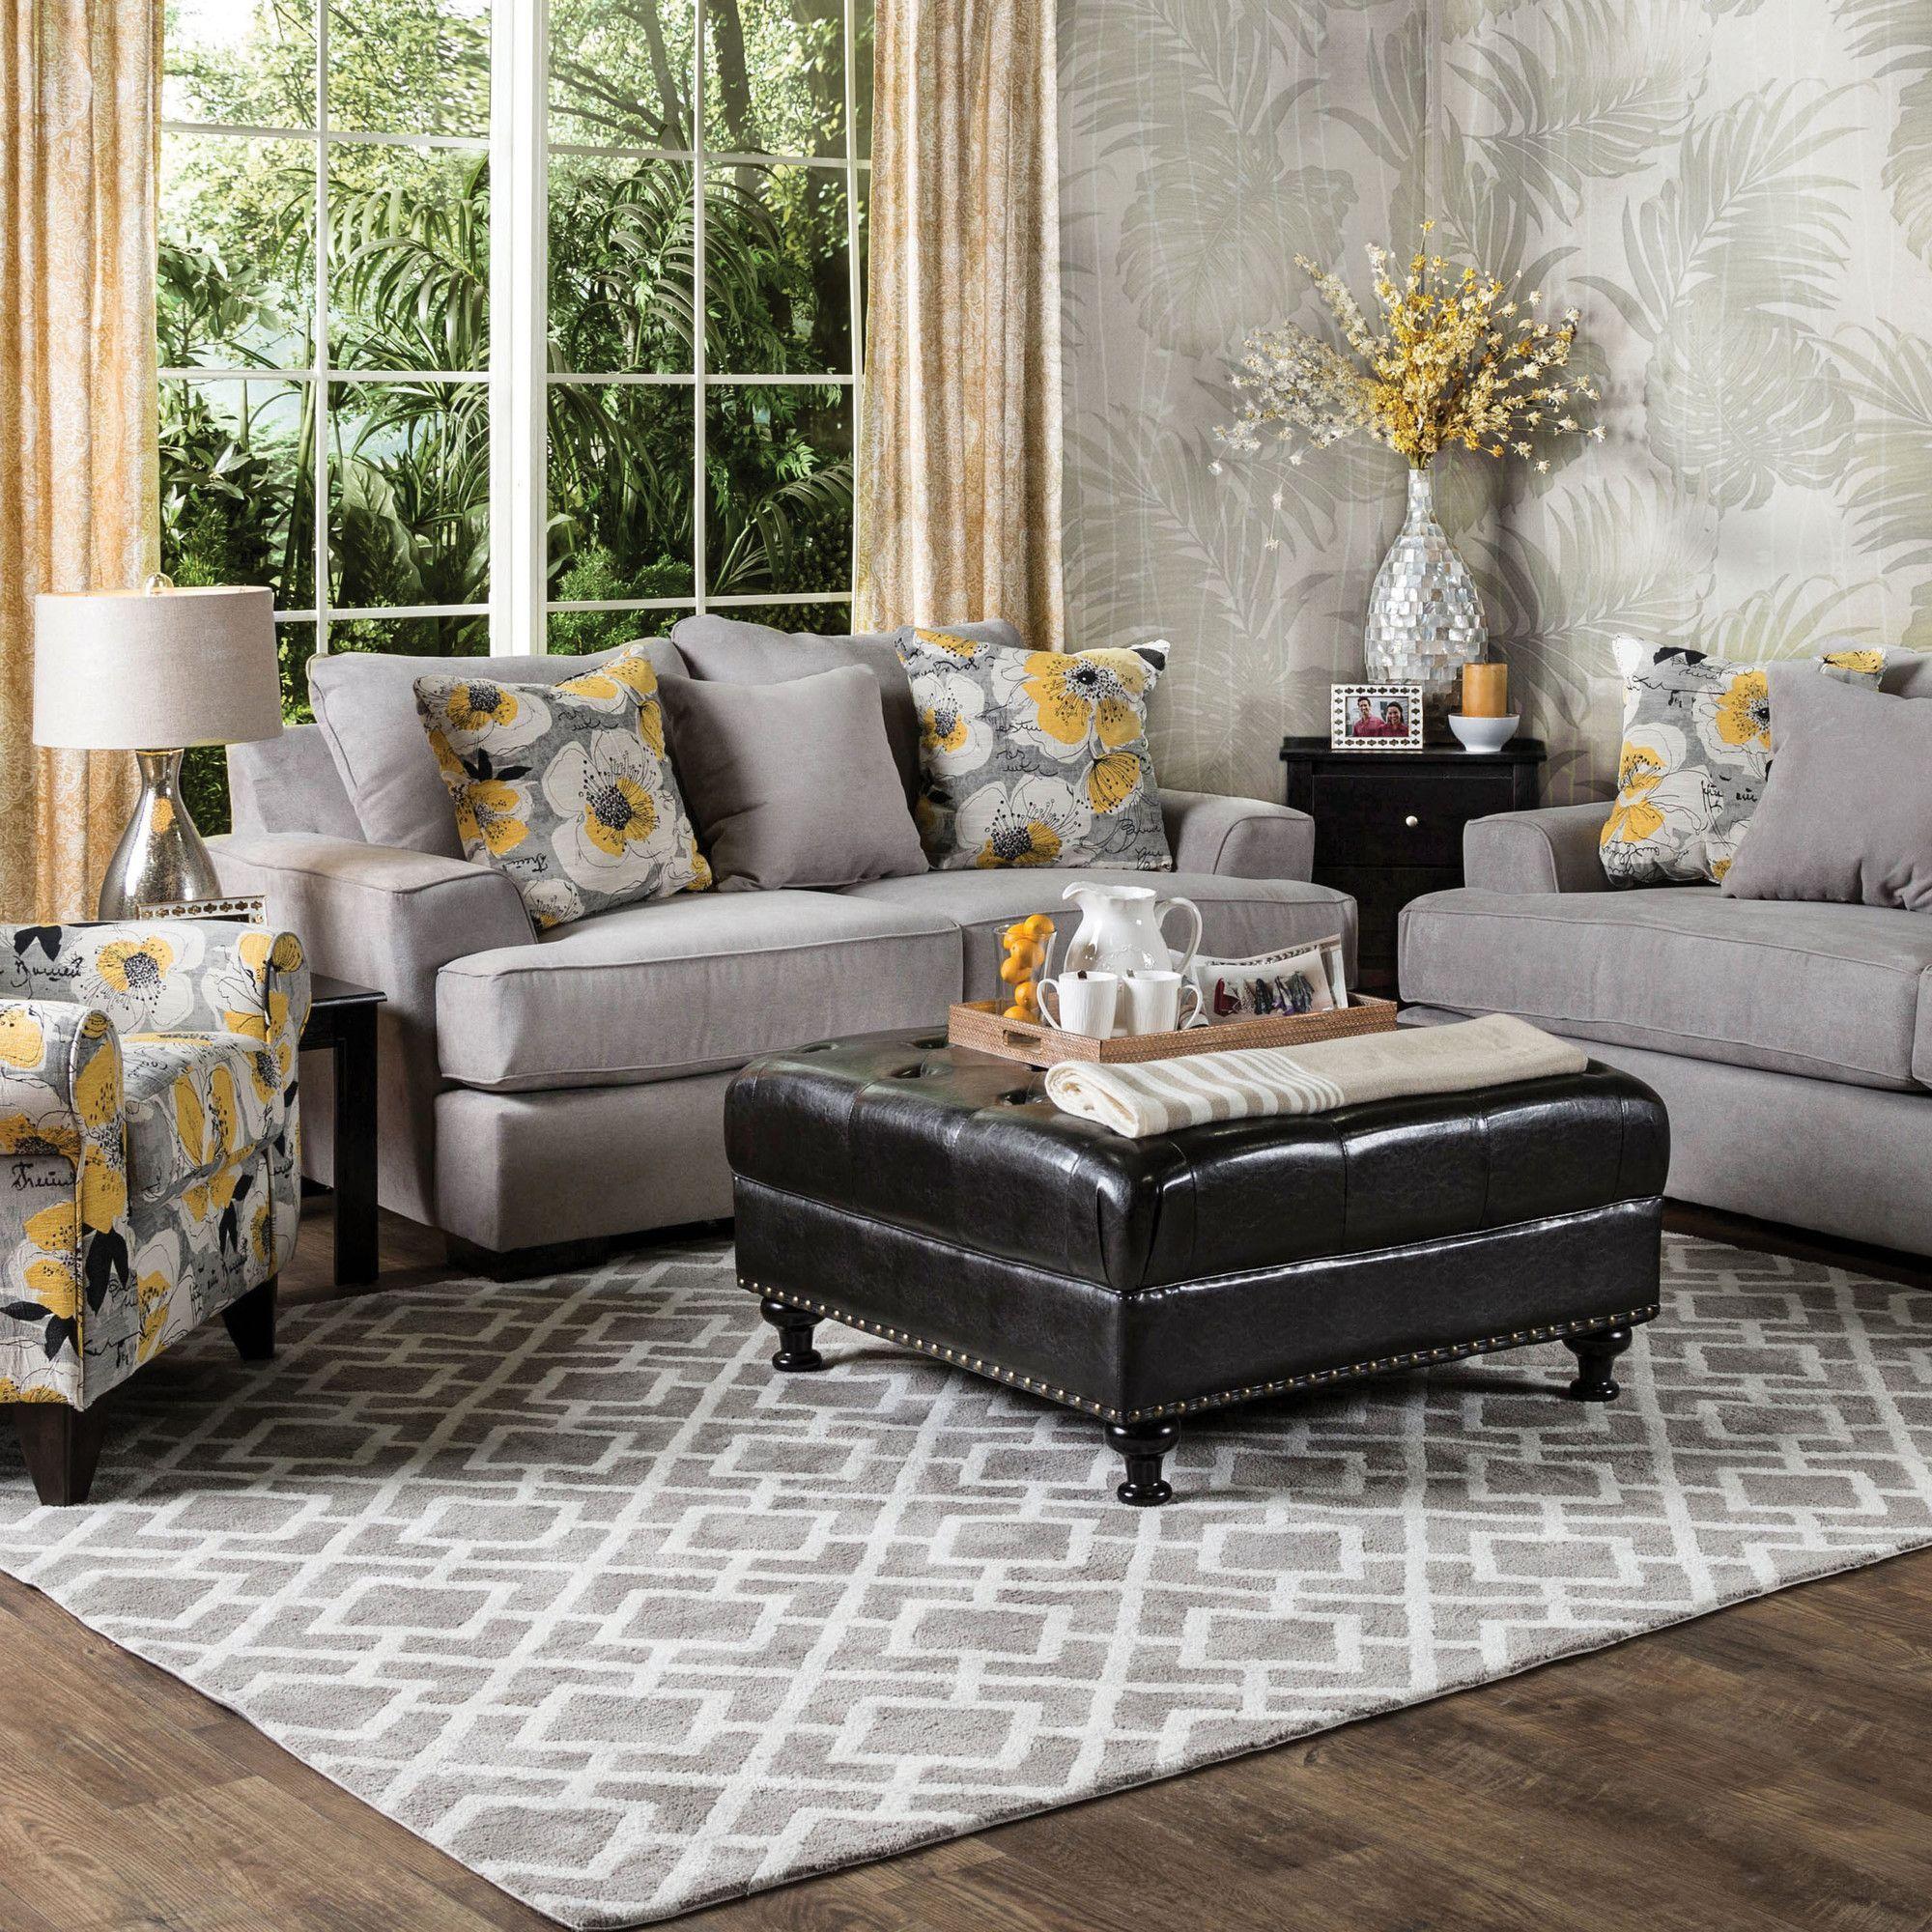 Black mesa loveseat sleeper sofa modern sofa love seat barrel couches